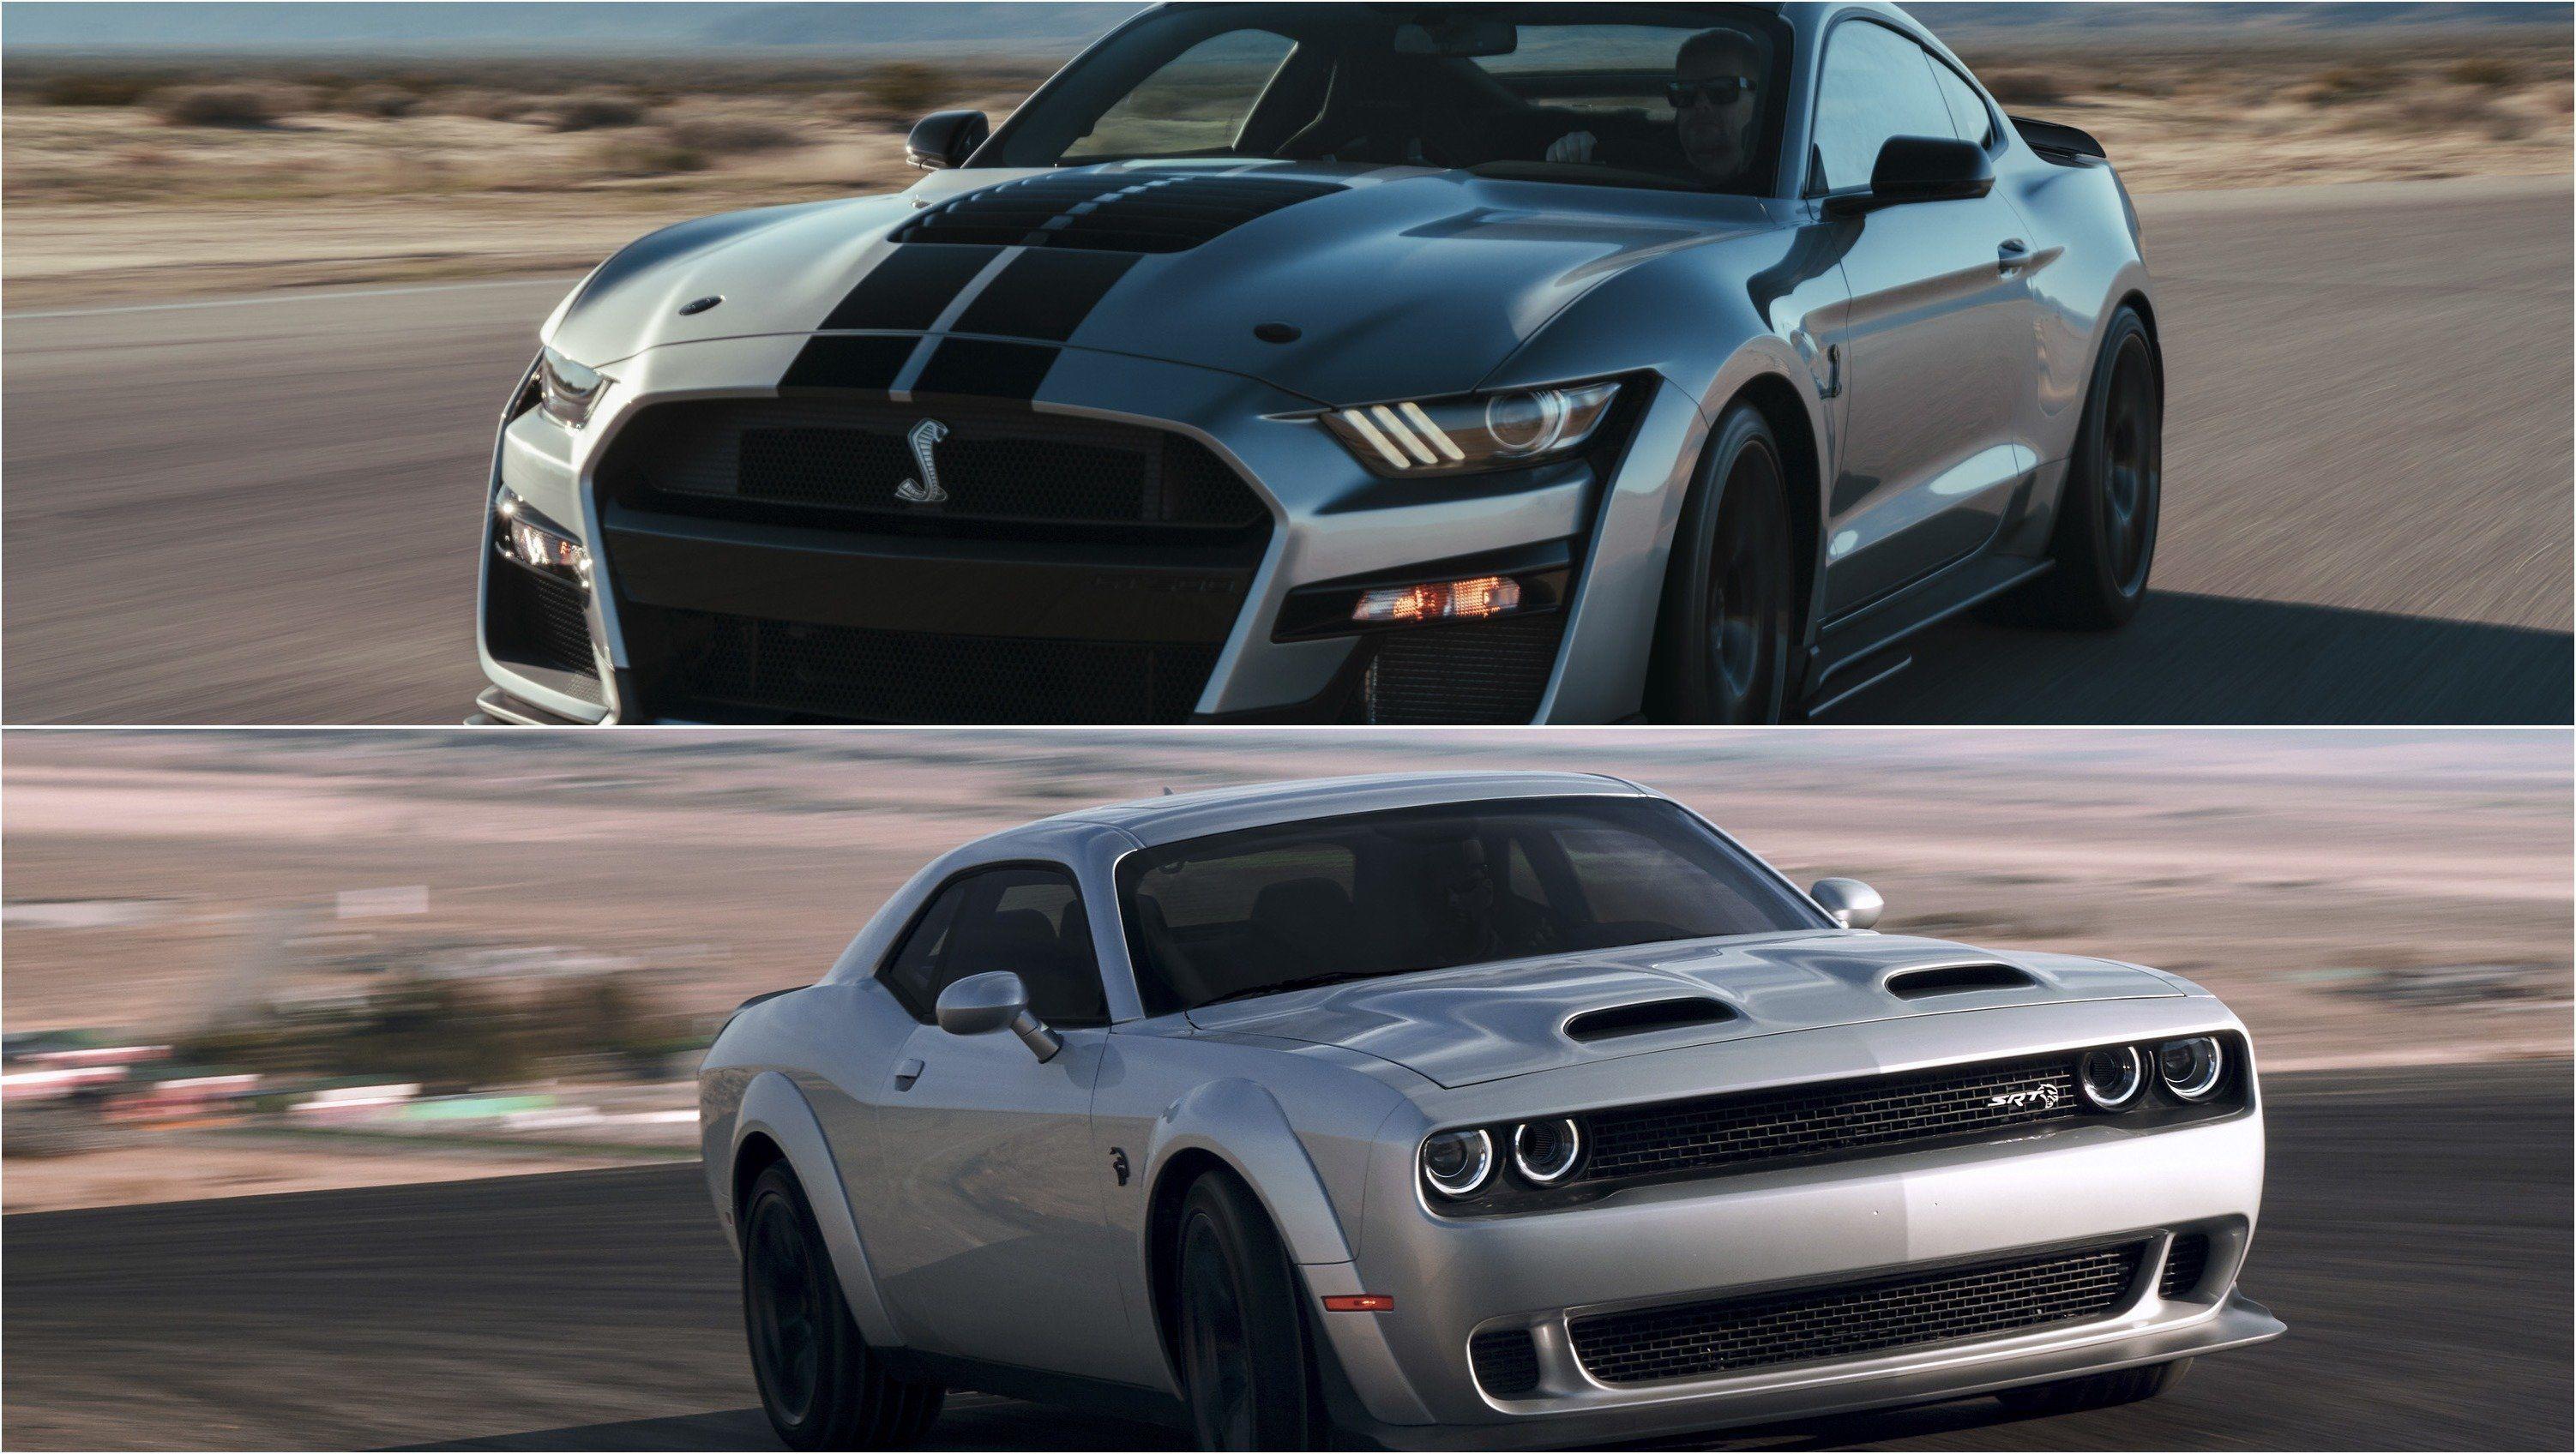 2020 Ford Mustang Shelby Gt500 Vs 2019 Dodge Challenger Srt Redeye Shelby Gt500 Mustang Gt500 Ford Mustang Shelby Gt500